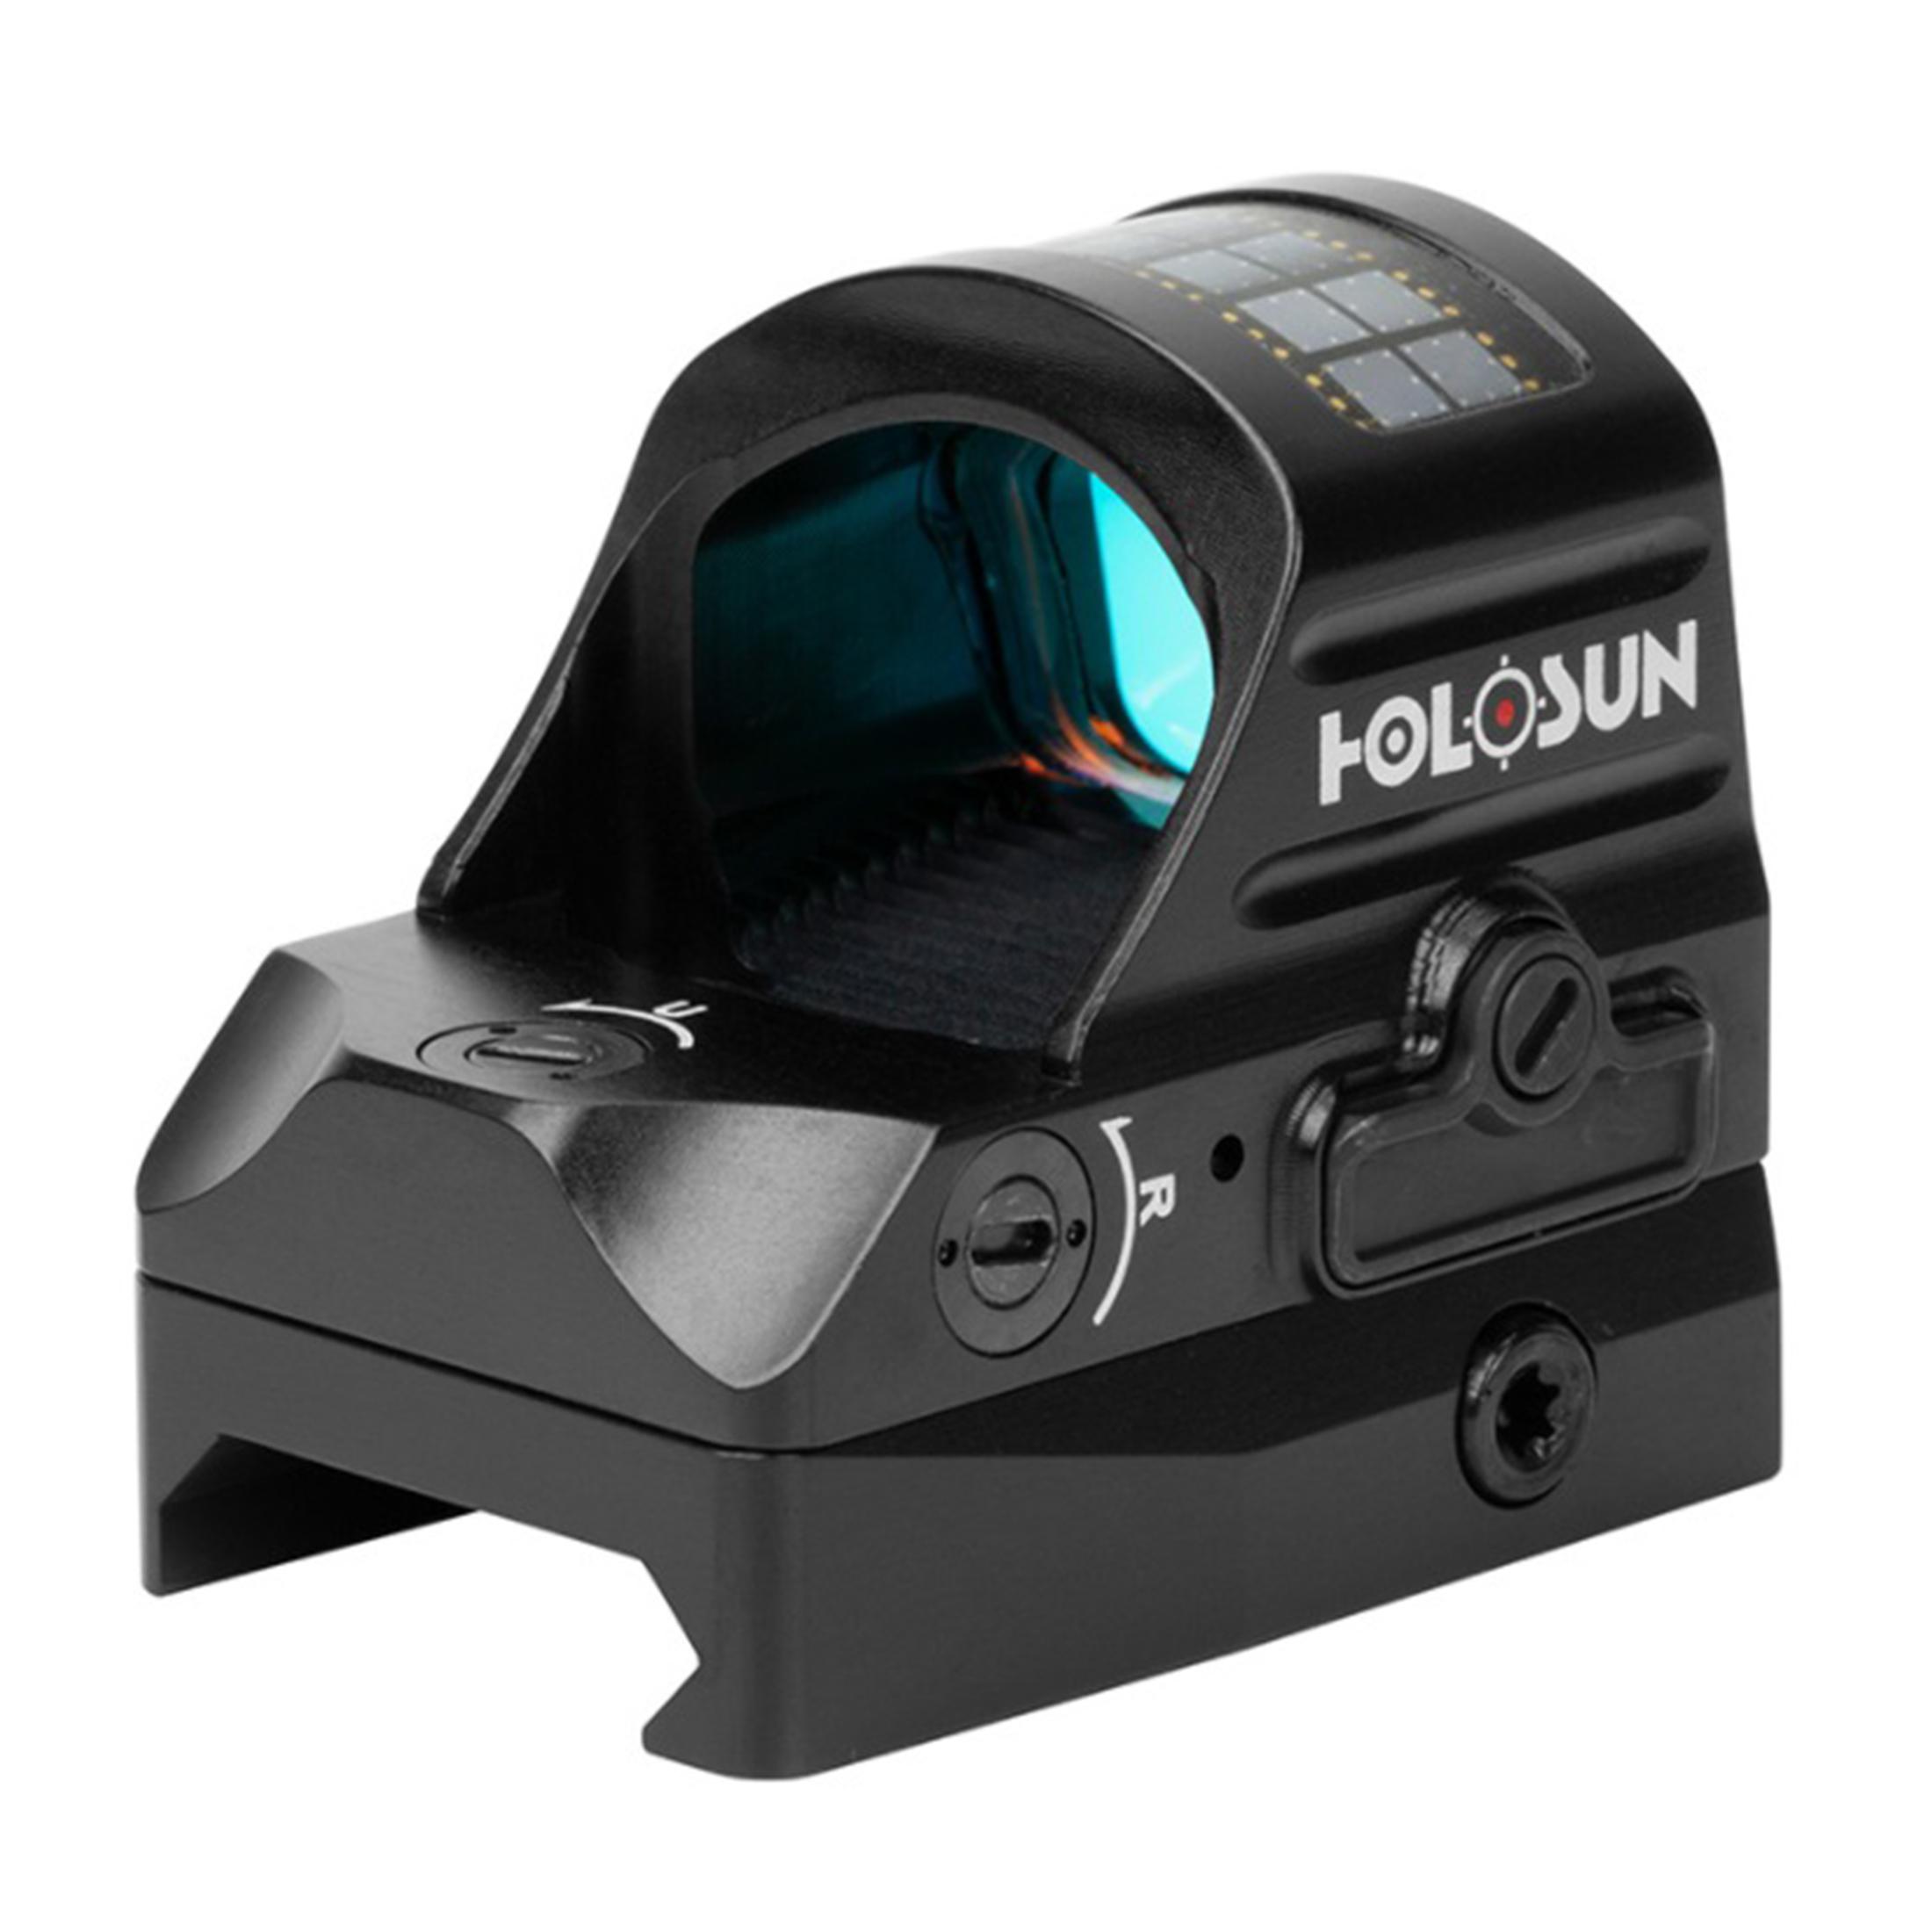 Holosun ELITE HE507C-GR-X2